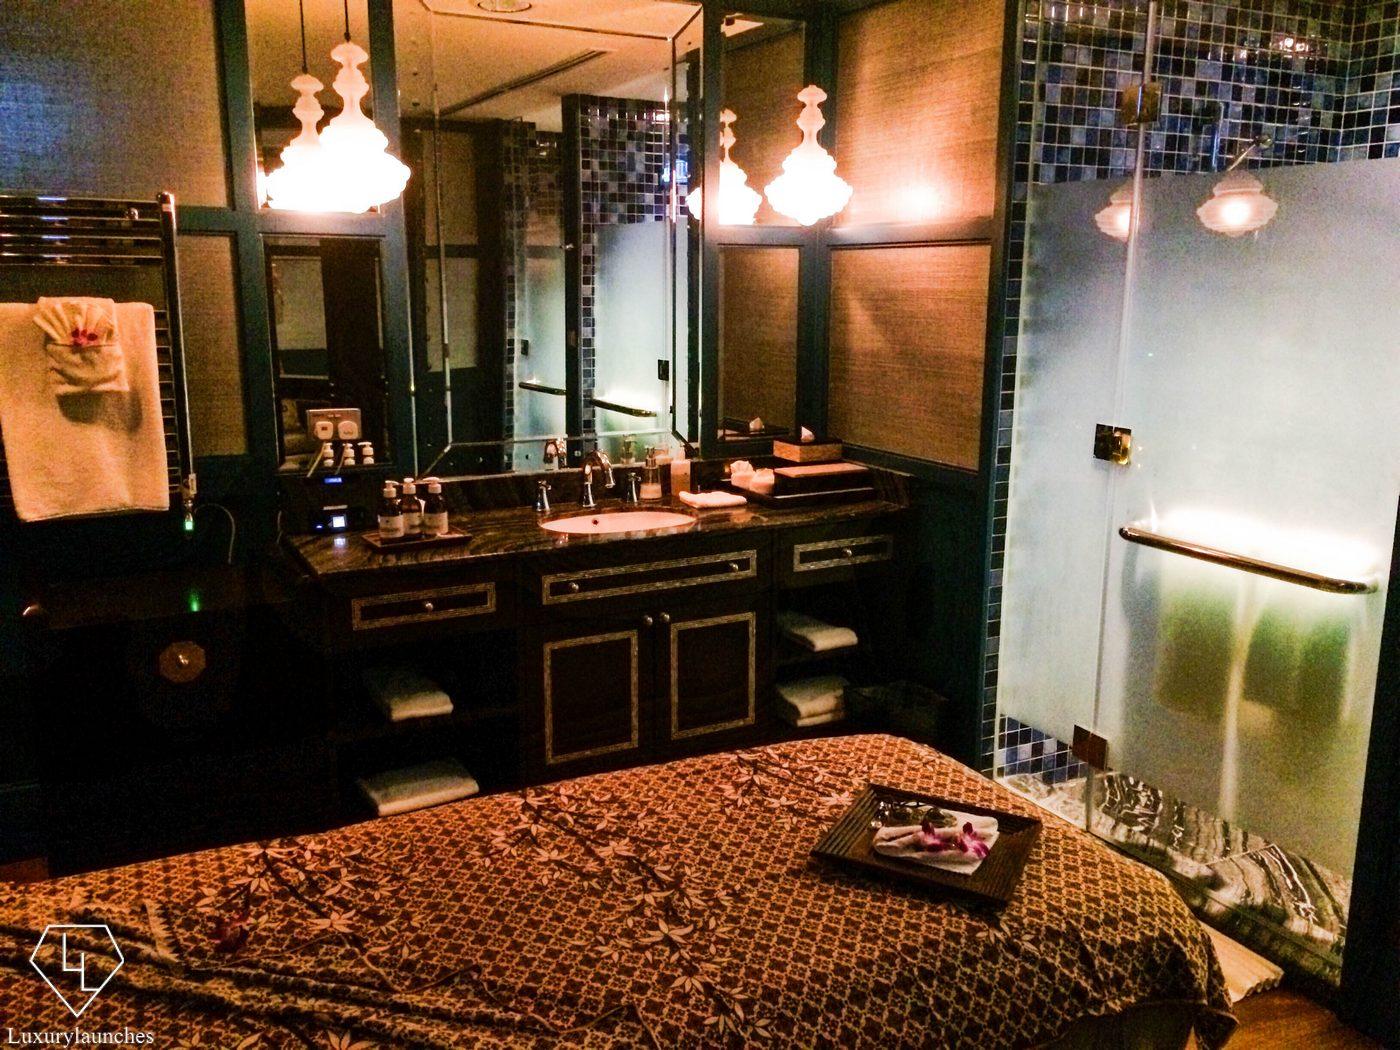 Spa review - The Mandarin Oriental Kuala Lumpur